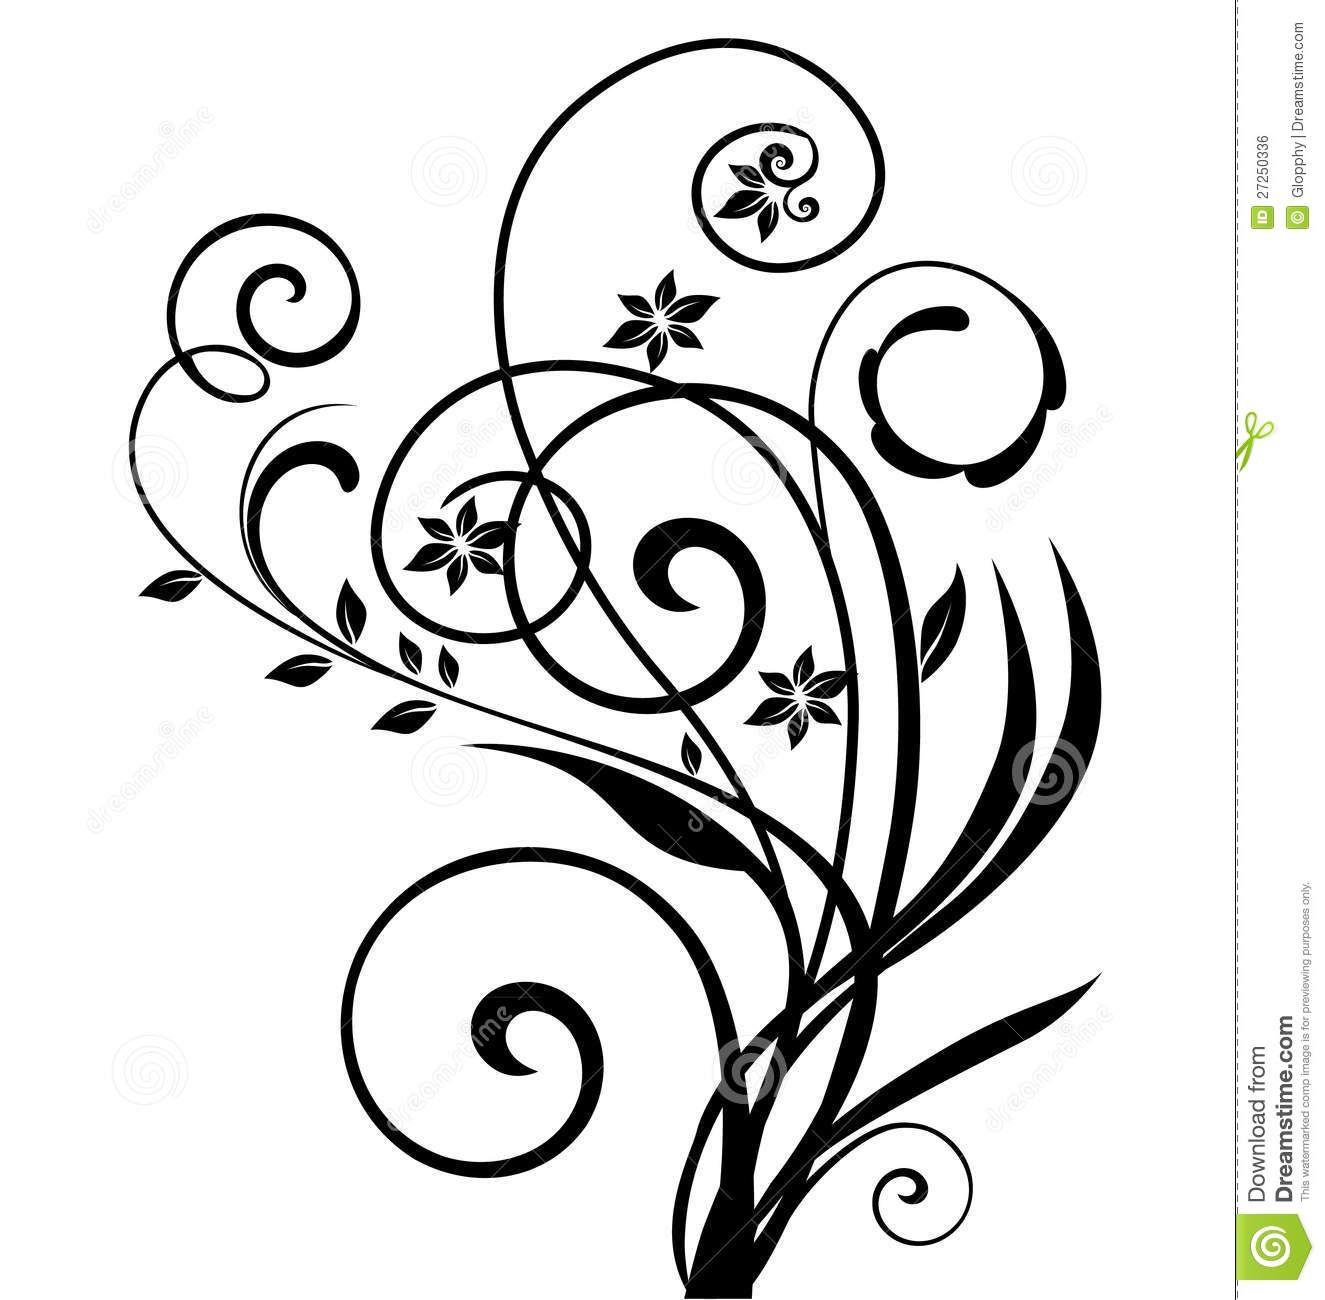 1325x1300 Swirly Floral Design 27250336.jpg Pixels Swirl